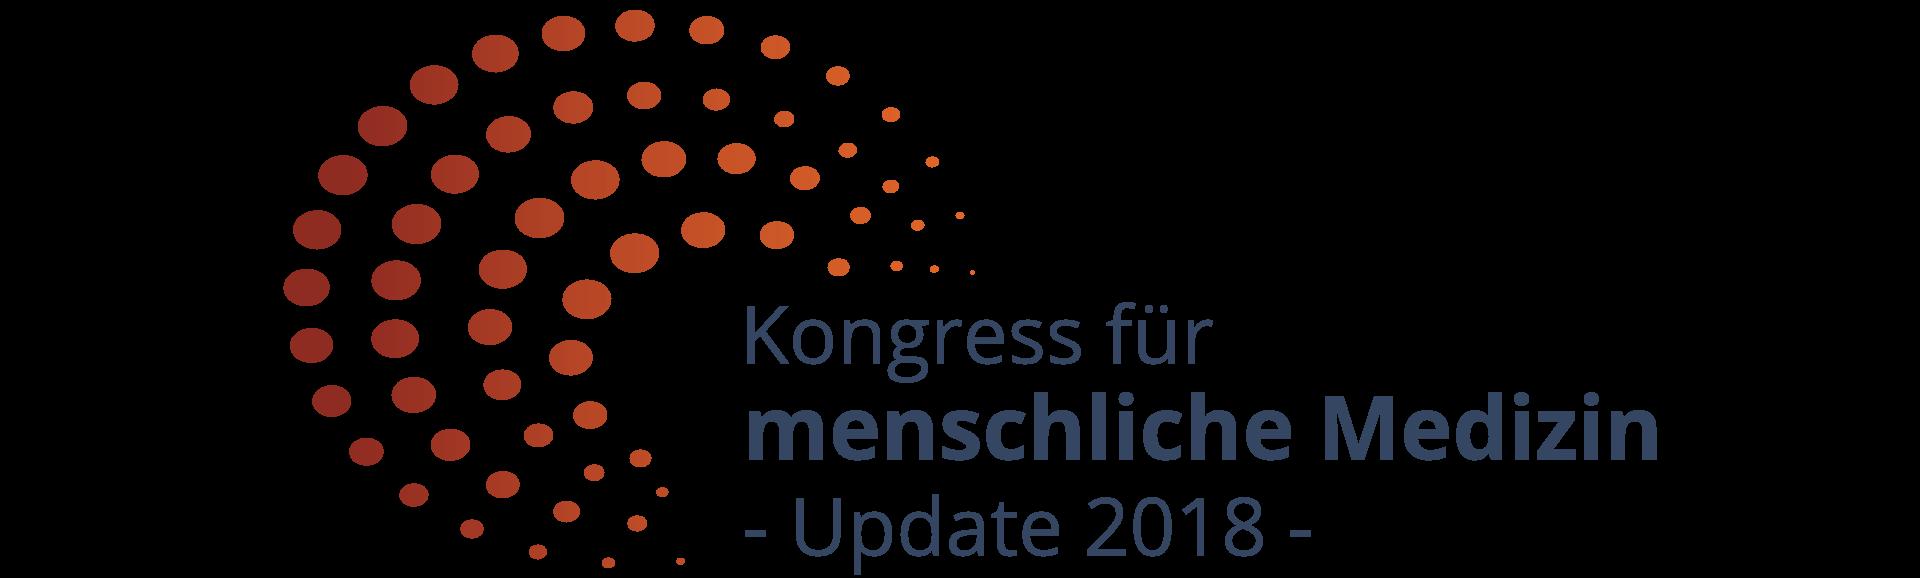 KMM2018 Banner